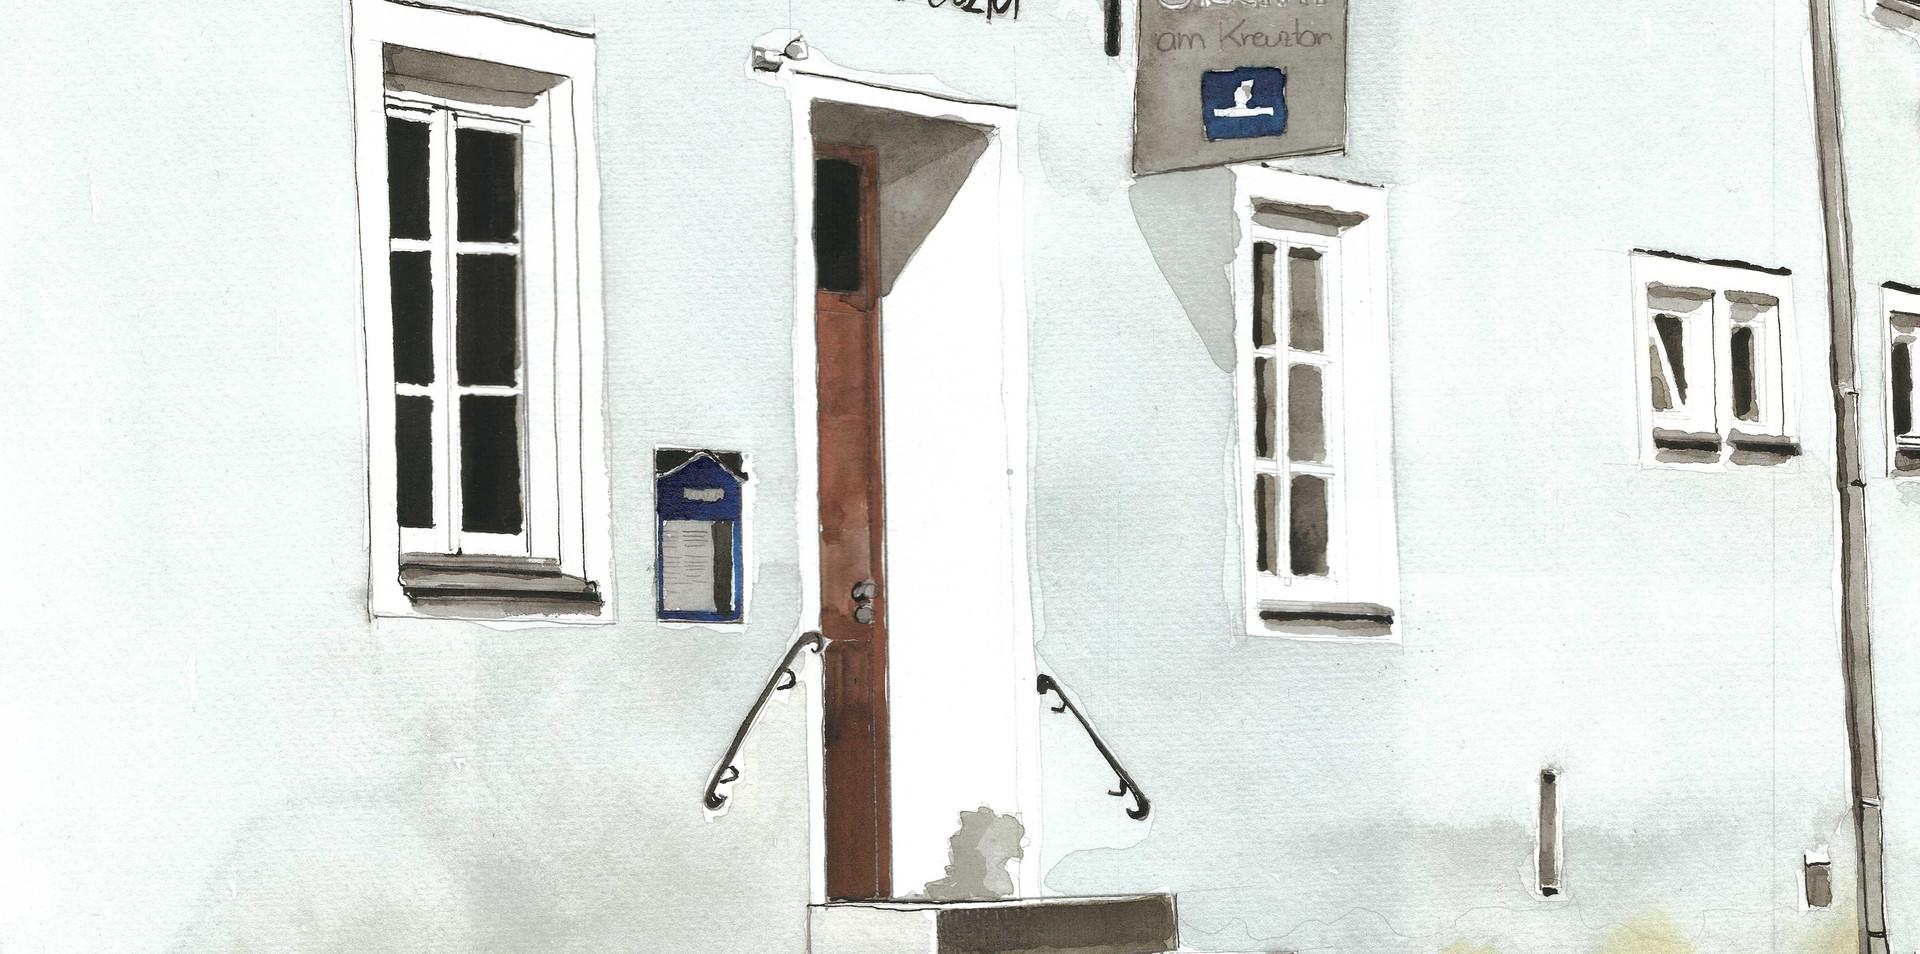 13 Glockn Eingang (verkauft)